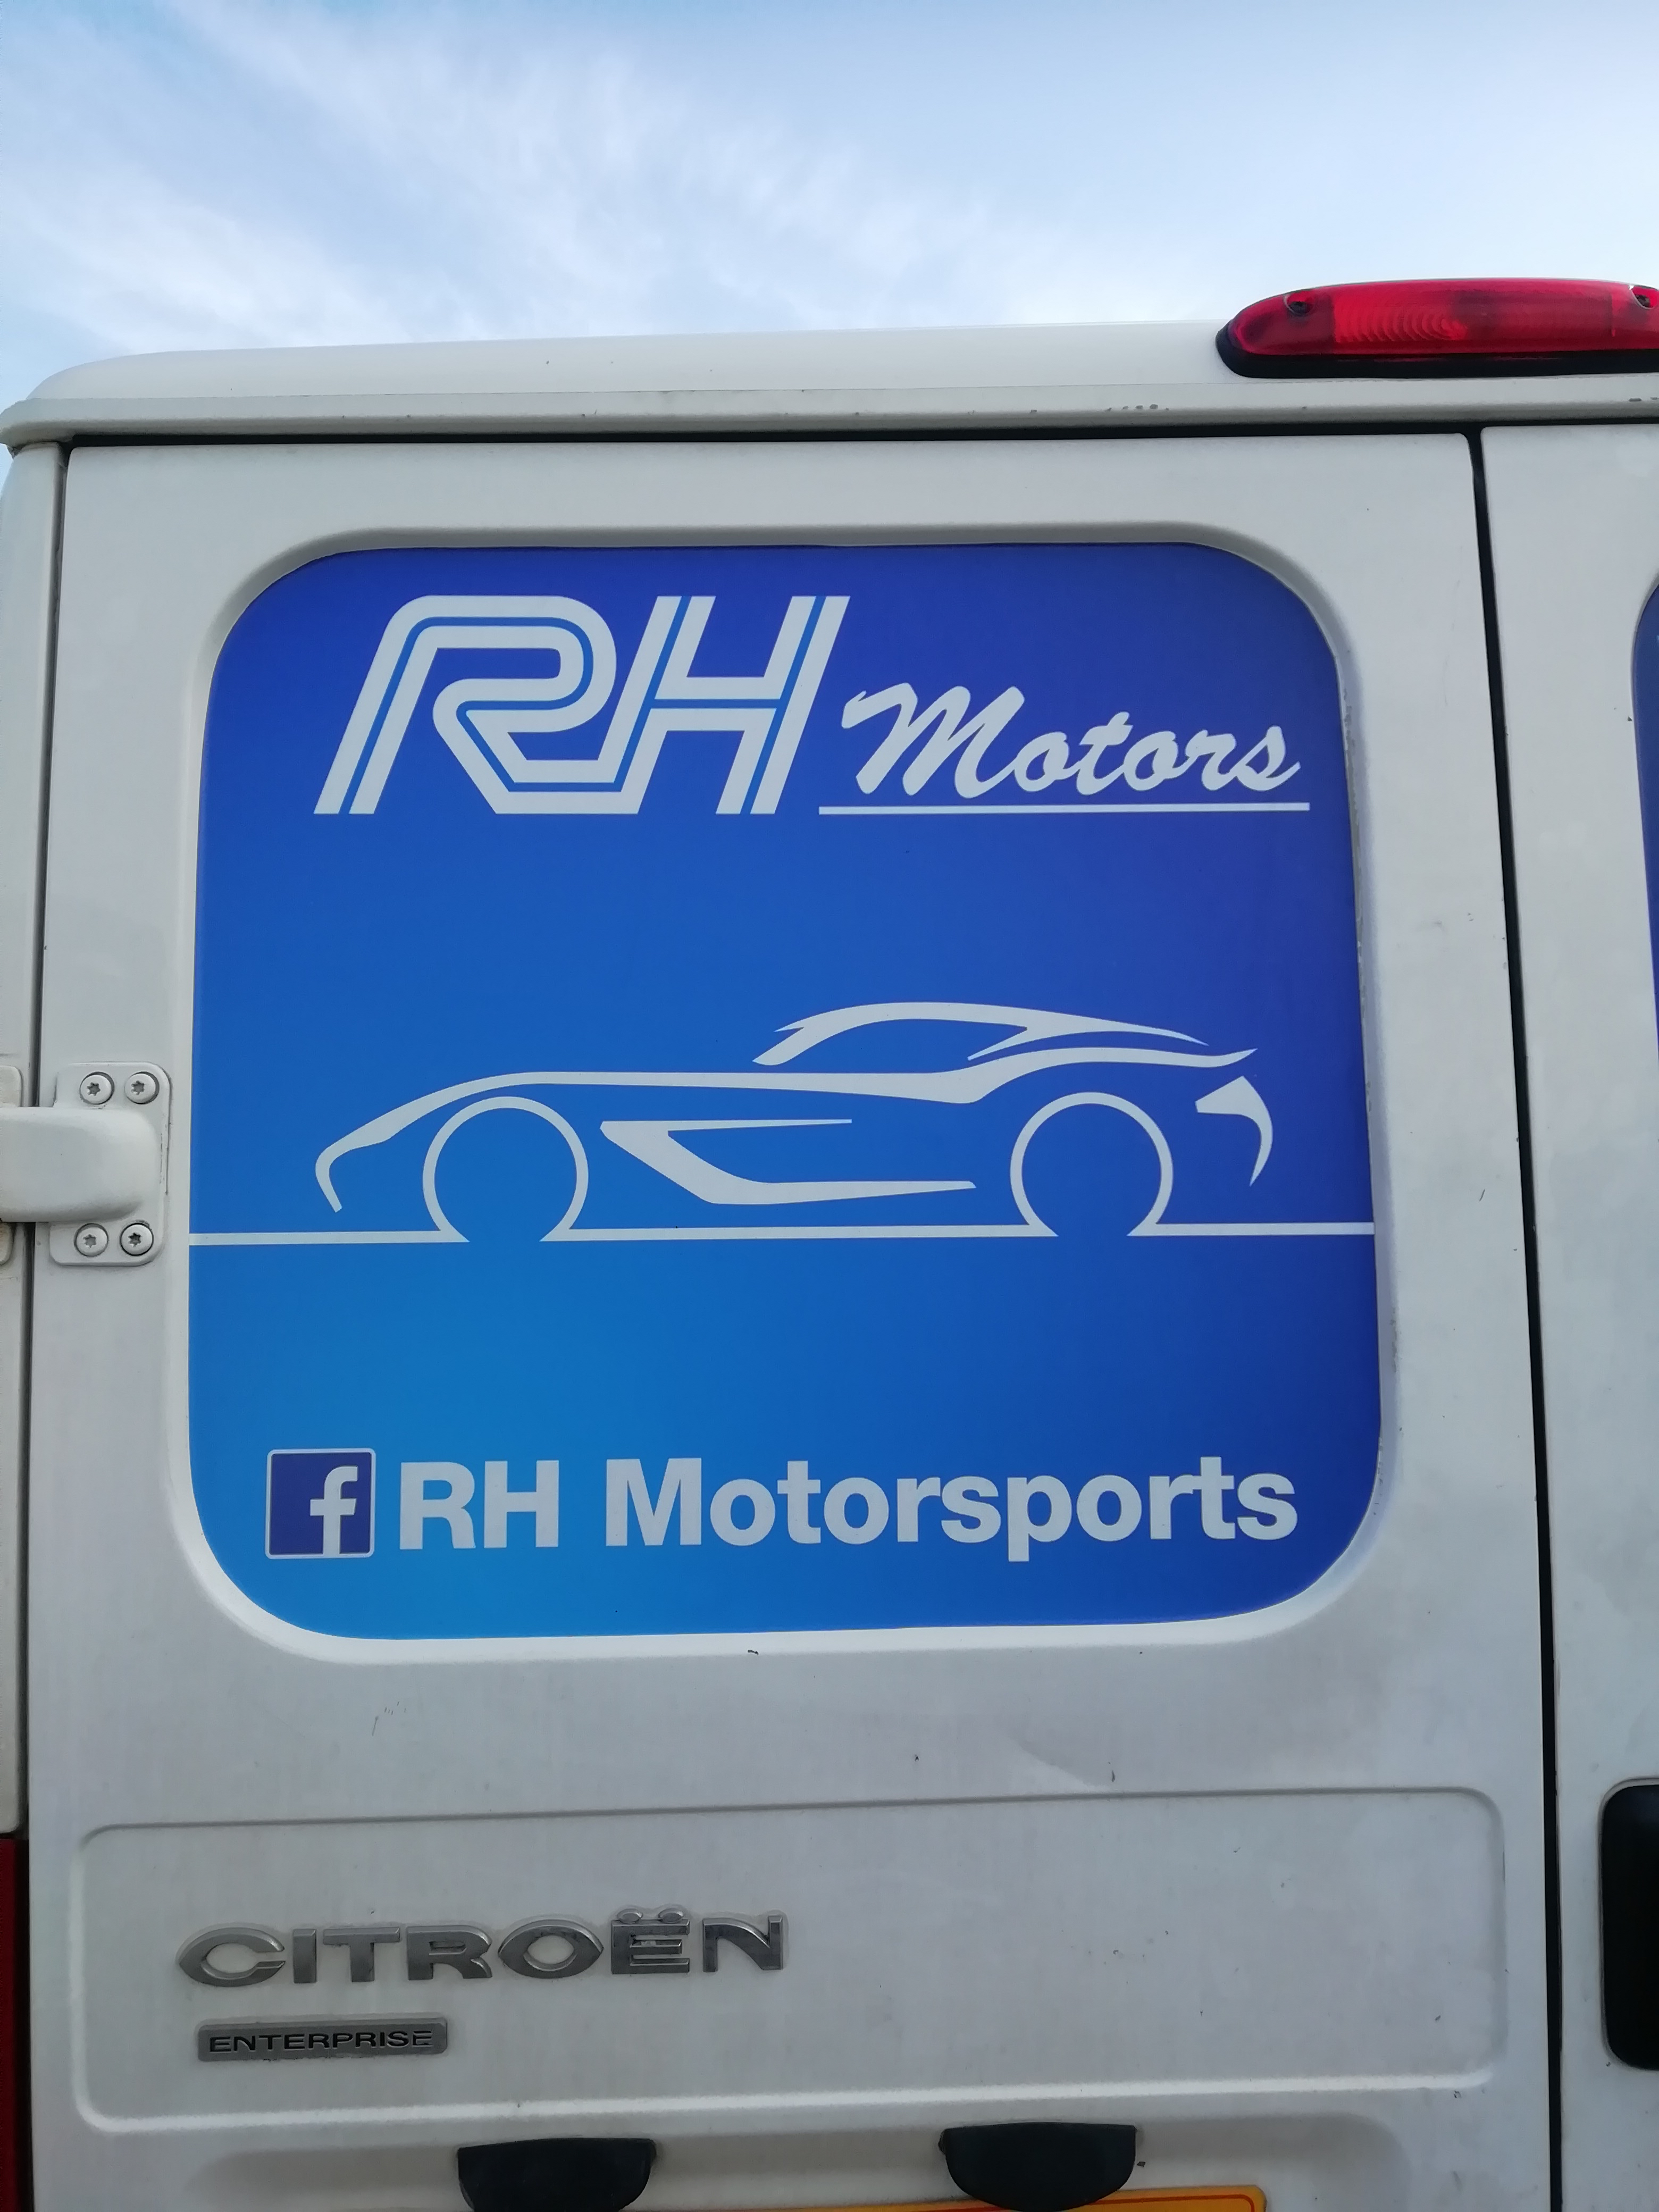 Rh Motors